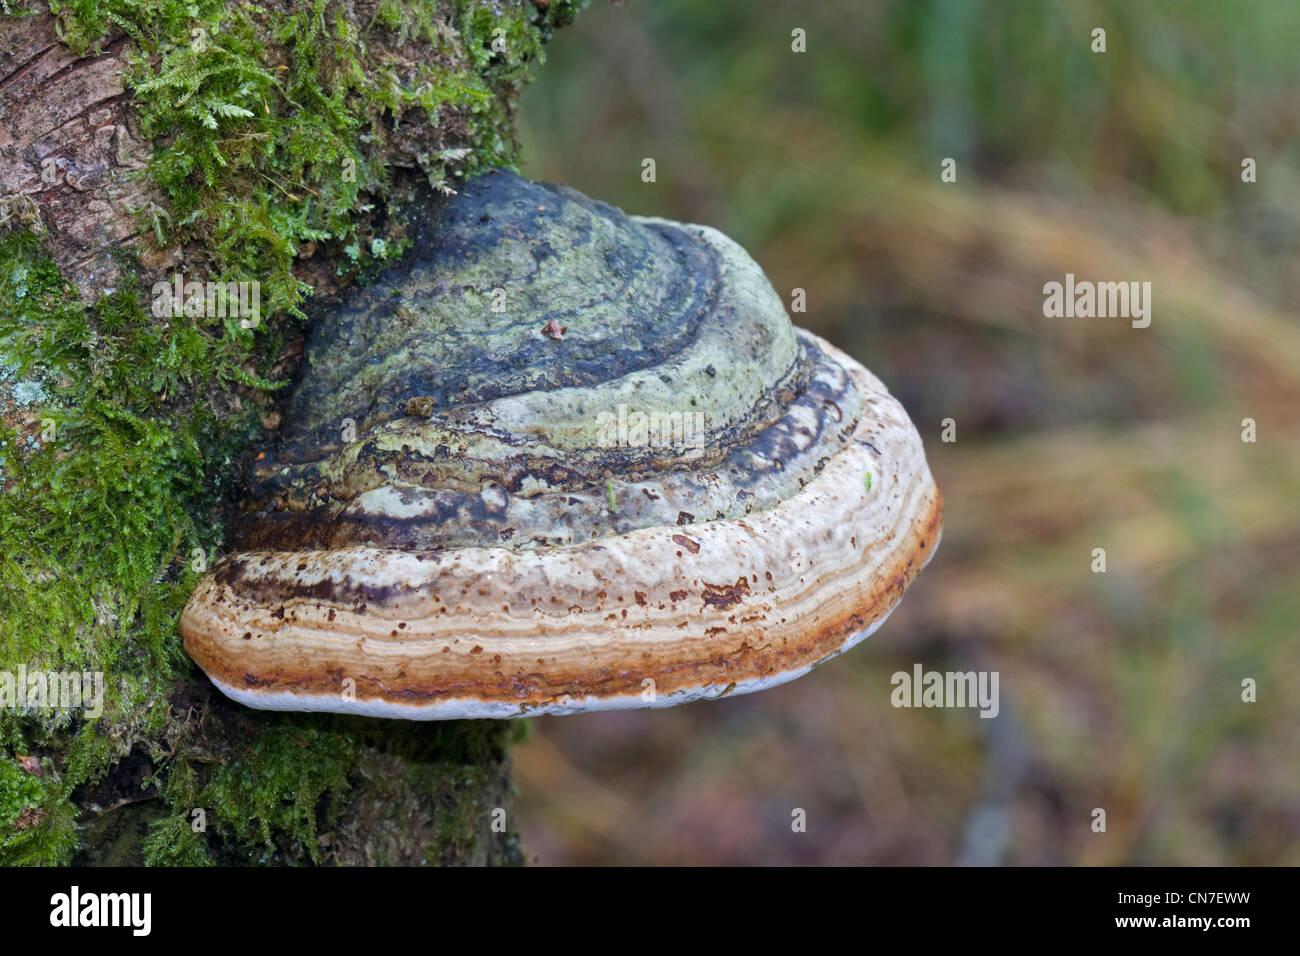 Beeswax Bracket (Ganoderma Pfeifferi) growing on an dead tree. - Stock Image